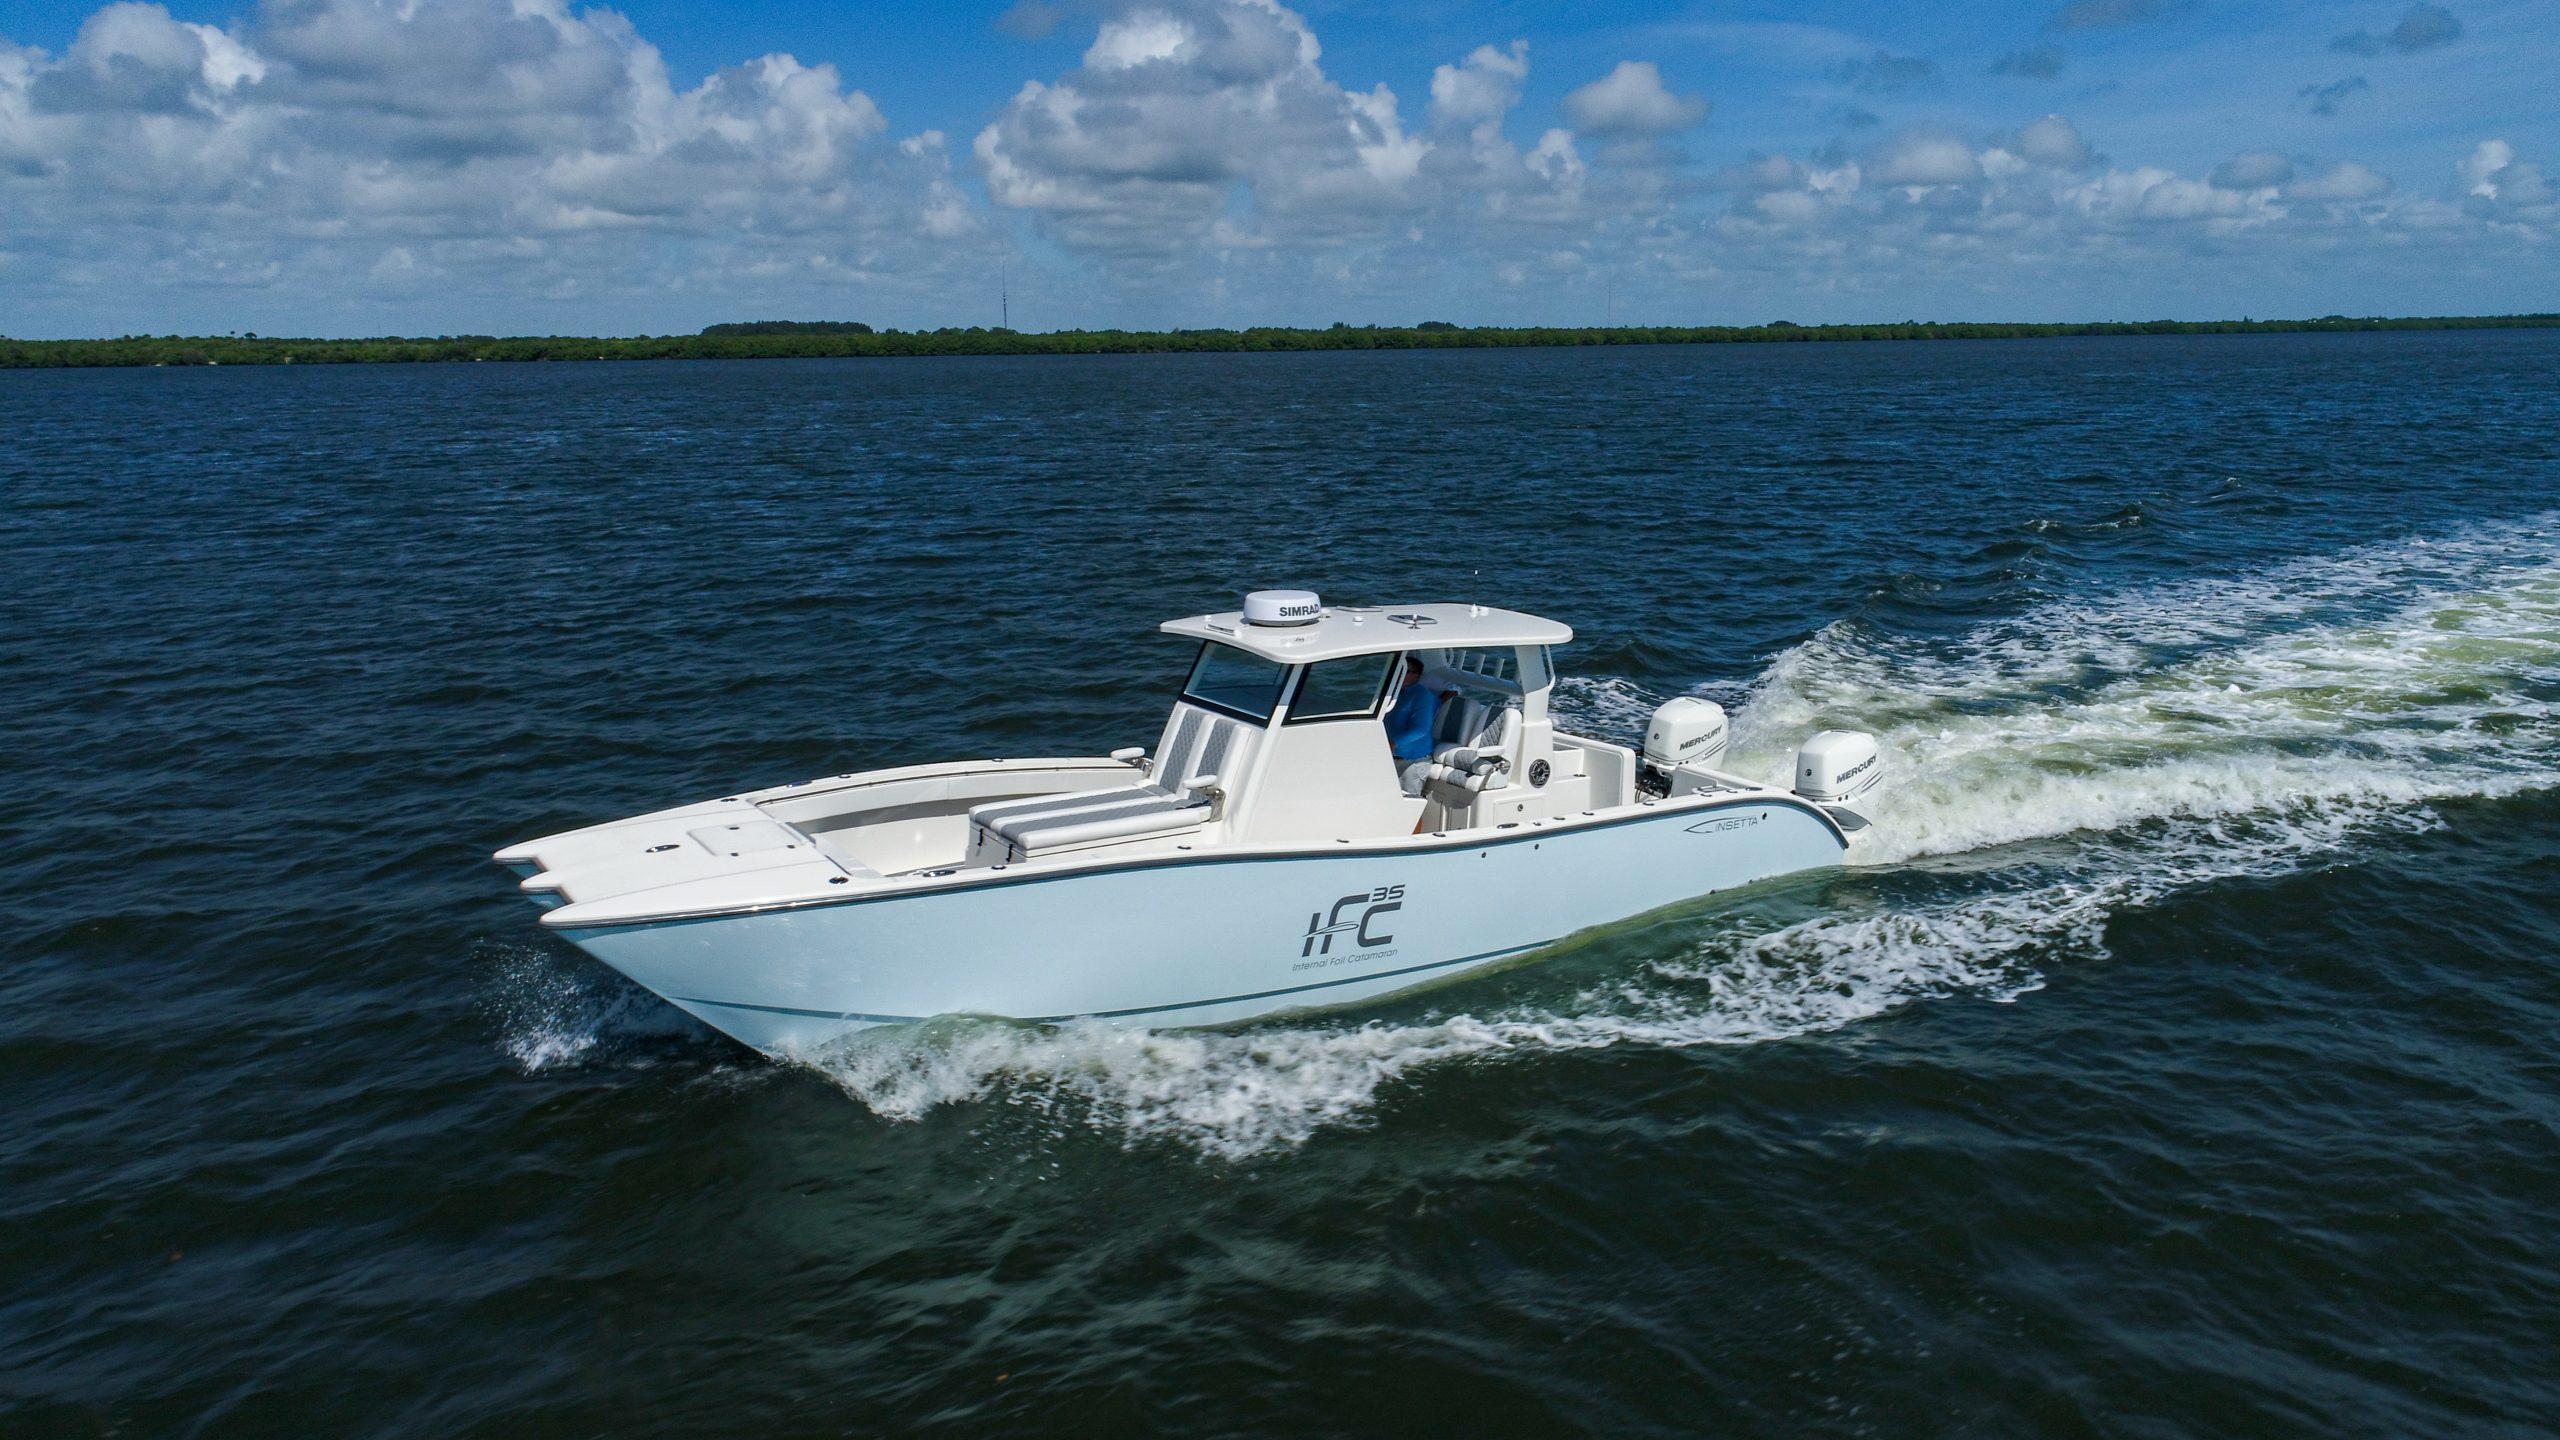 Insetta 35' Foiling Catamaran